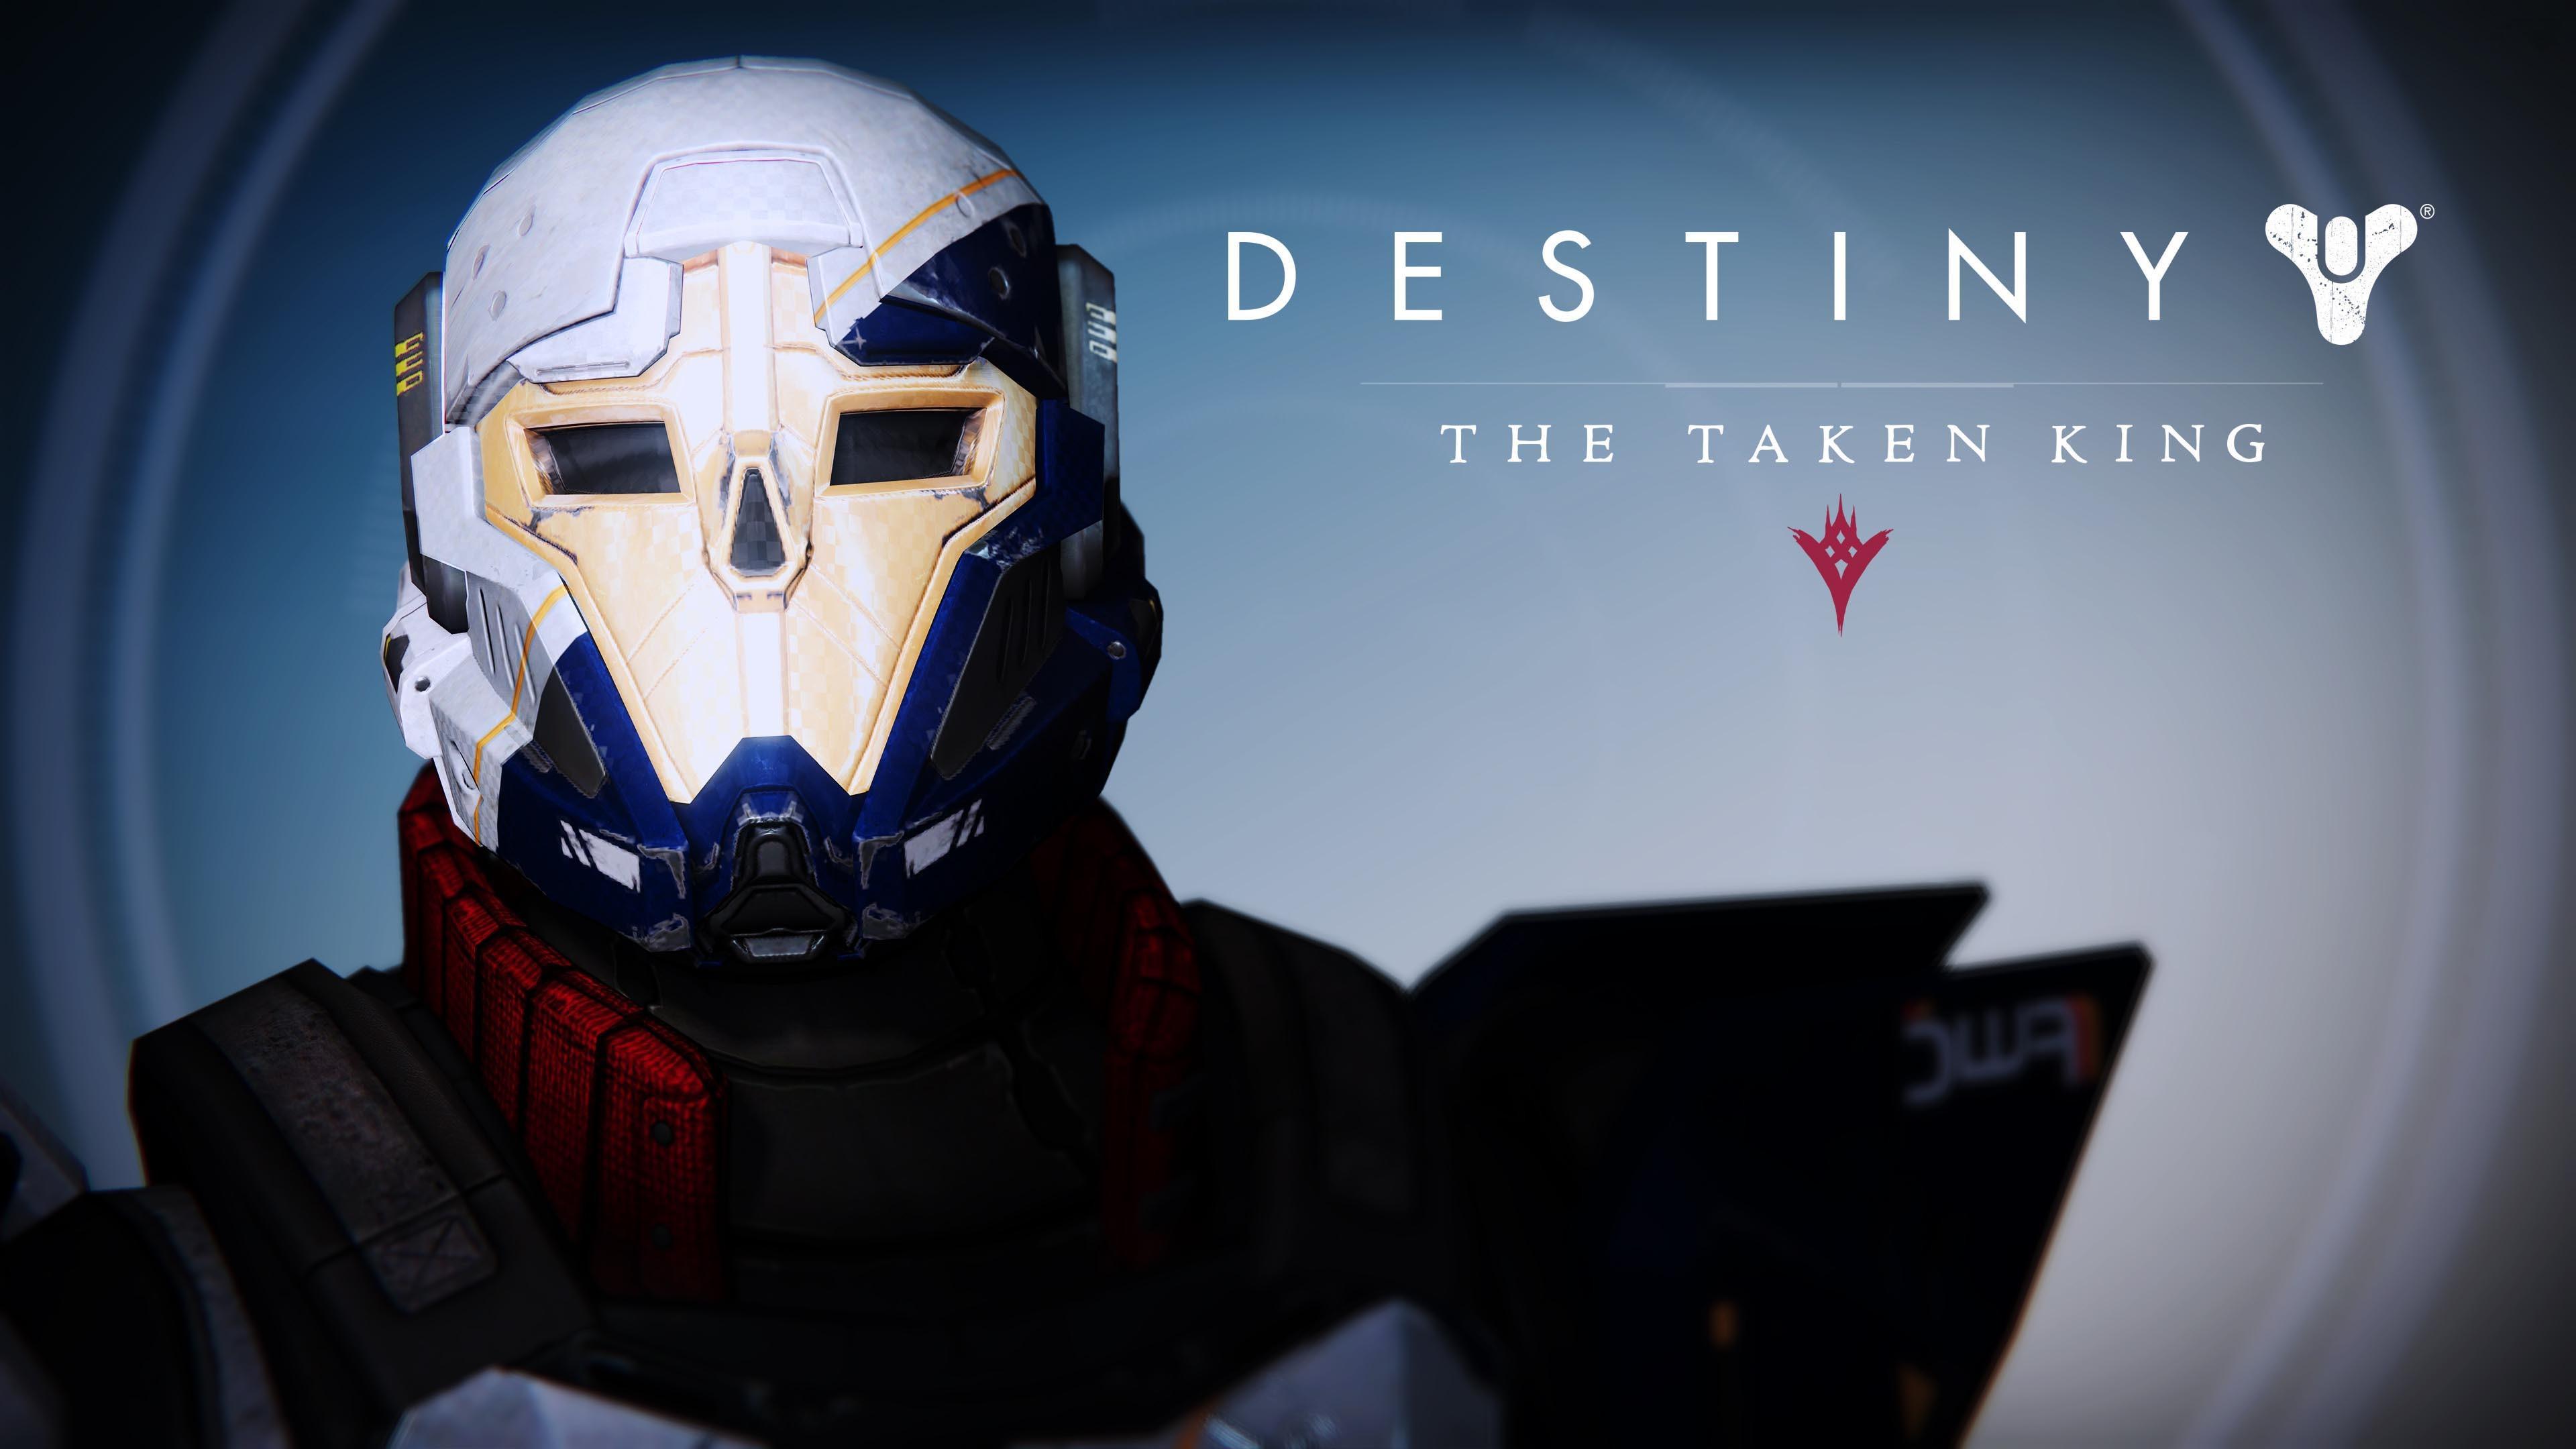 Destiny FWC Titan Male Helmet – Destiny The Taken King wallpaper